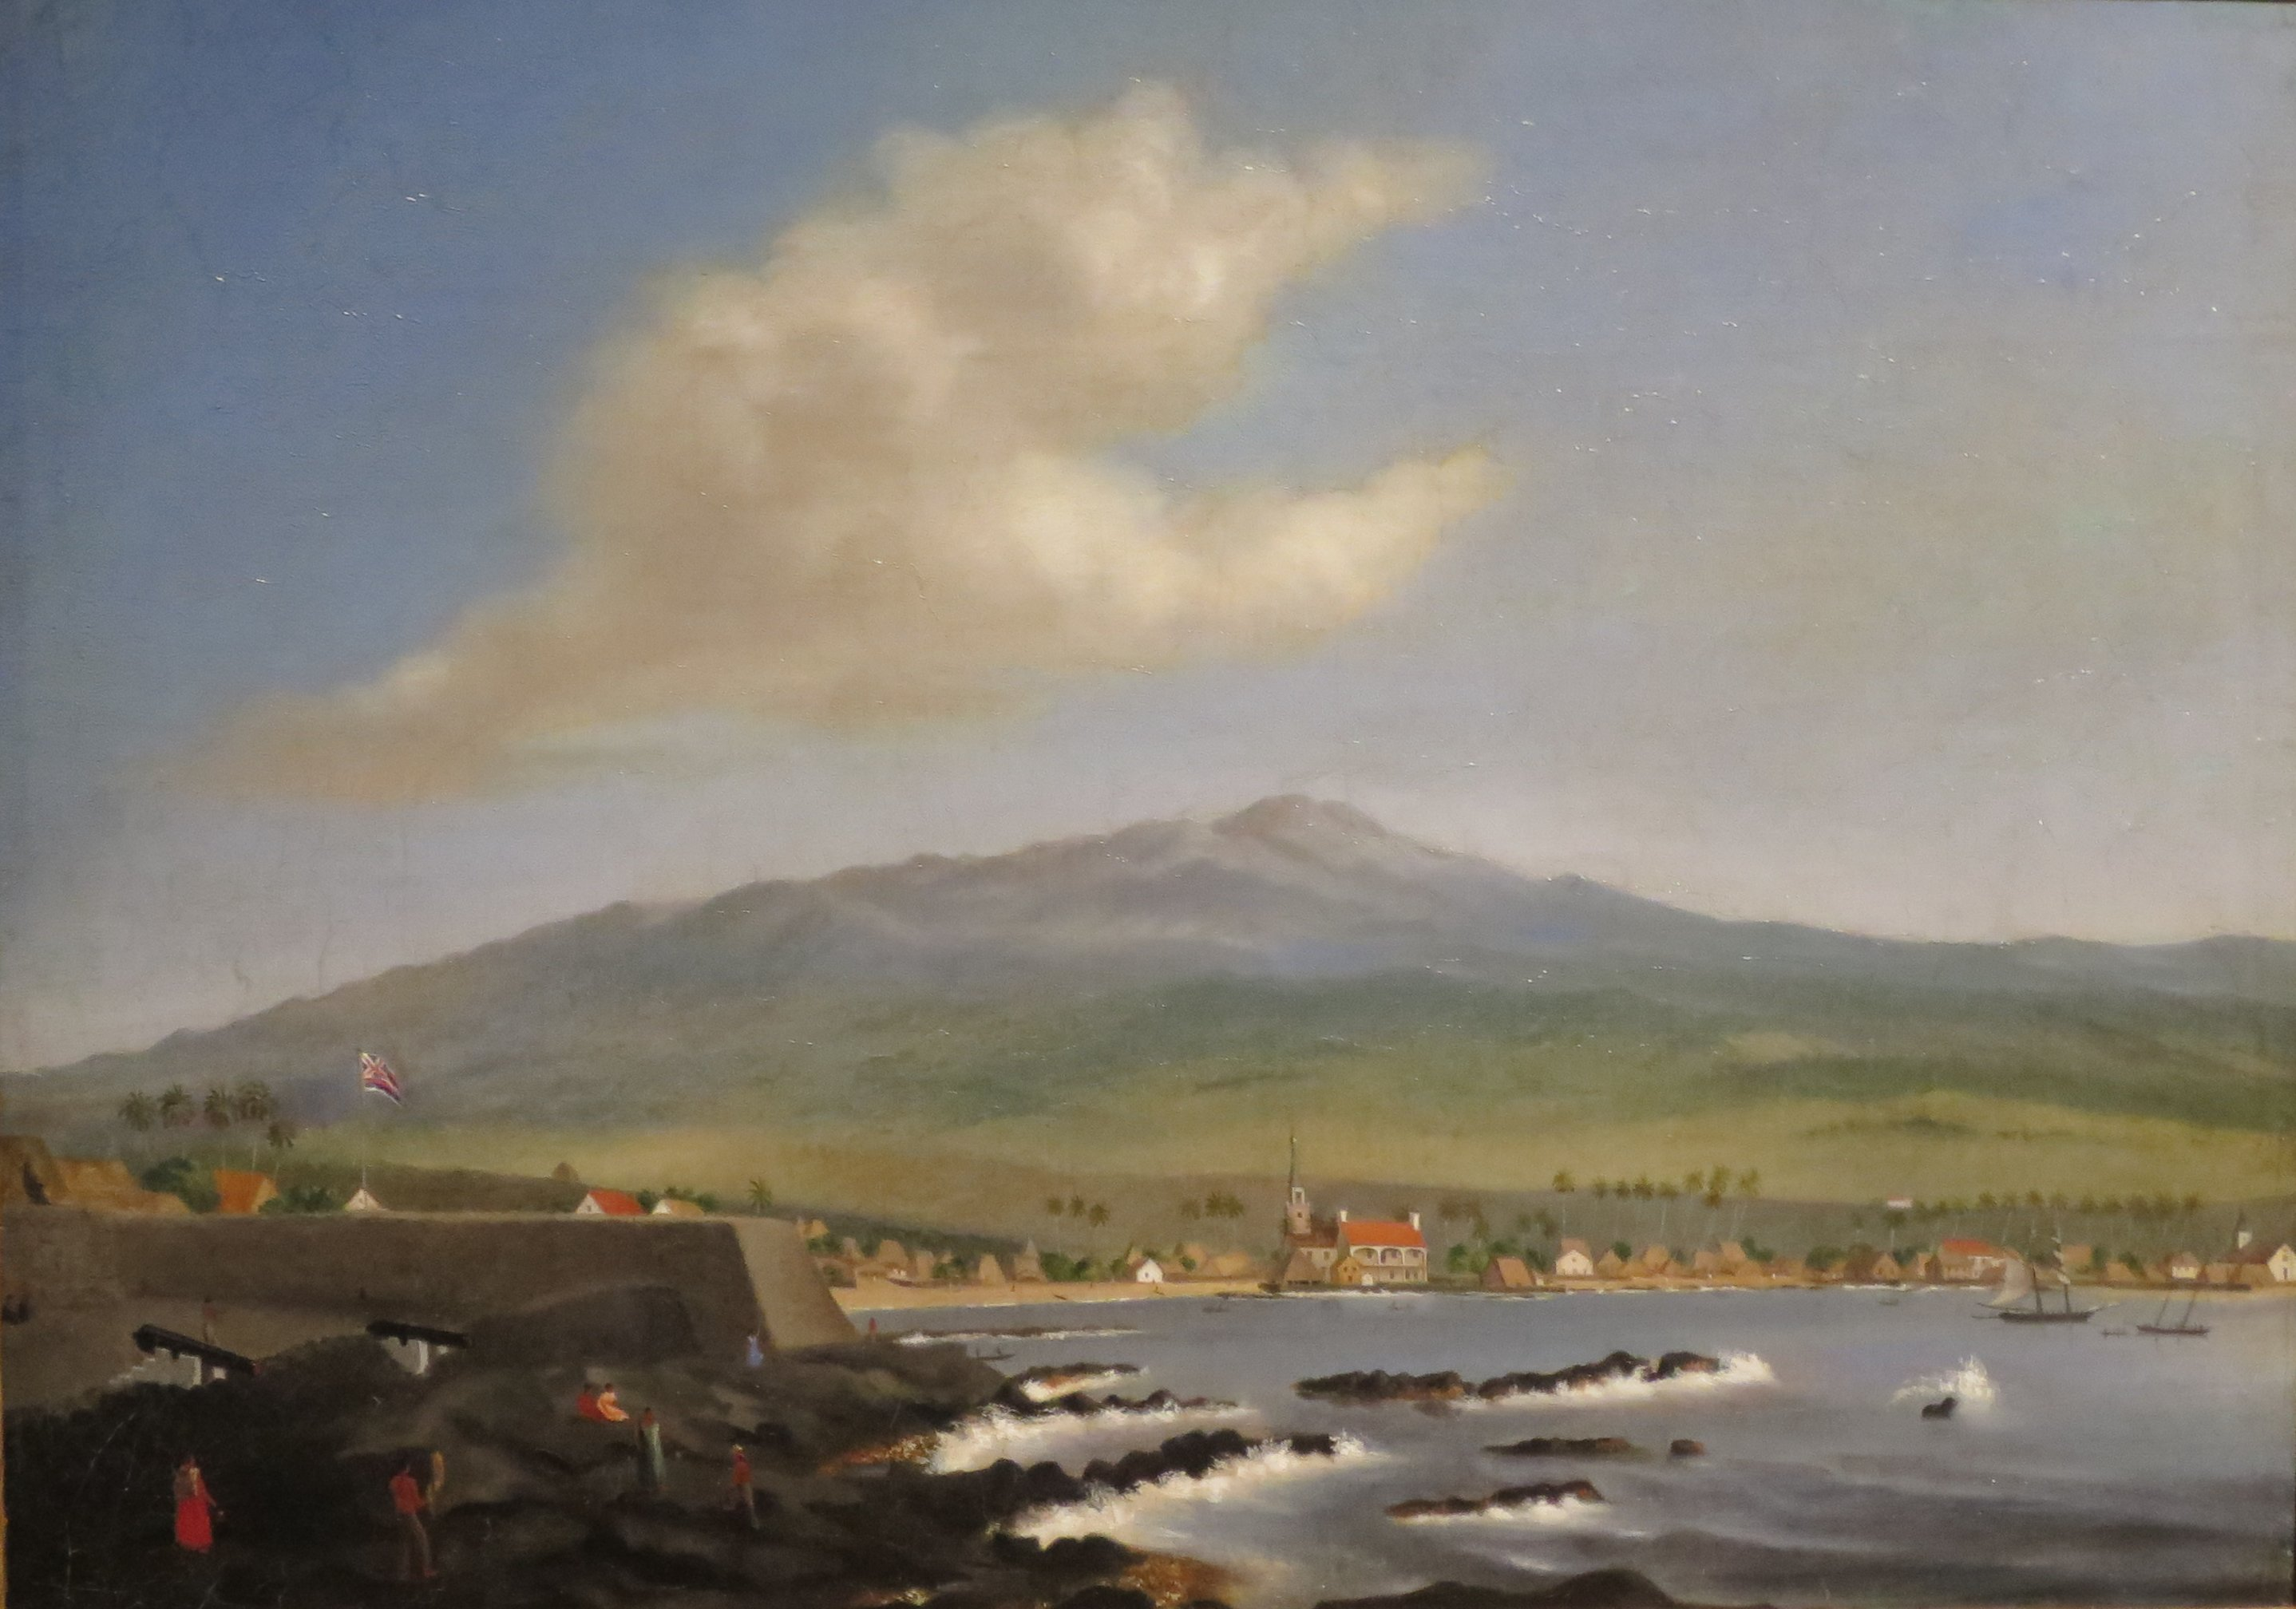 File:WLA haa Kailua Kona with Hualalai by James Gay Sawkins 1852.jpg